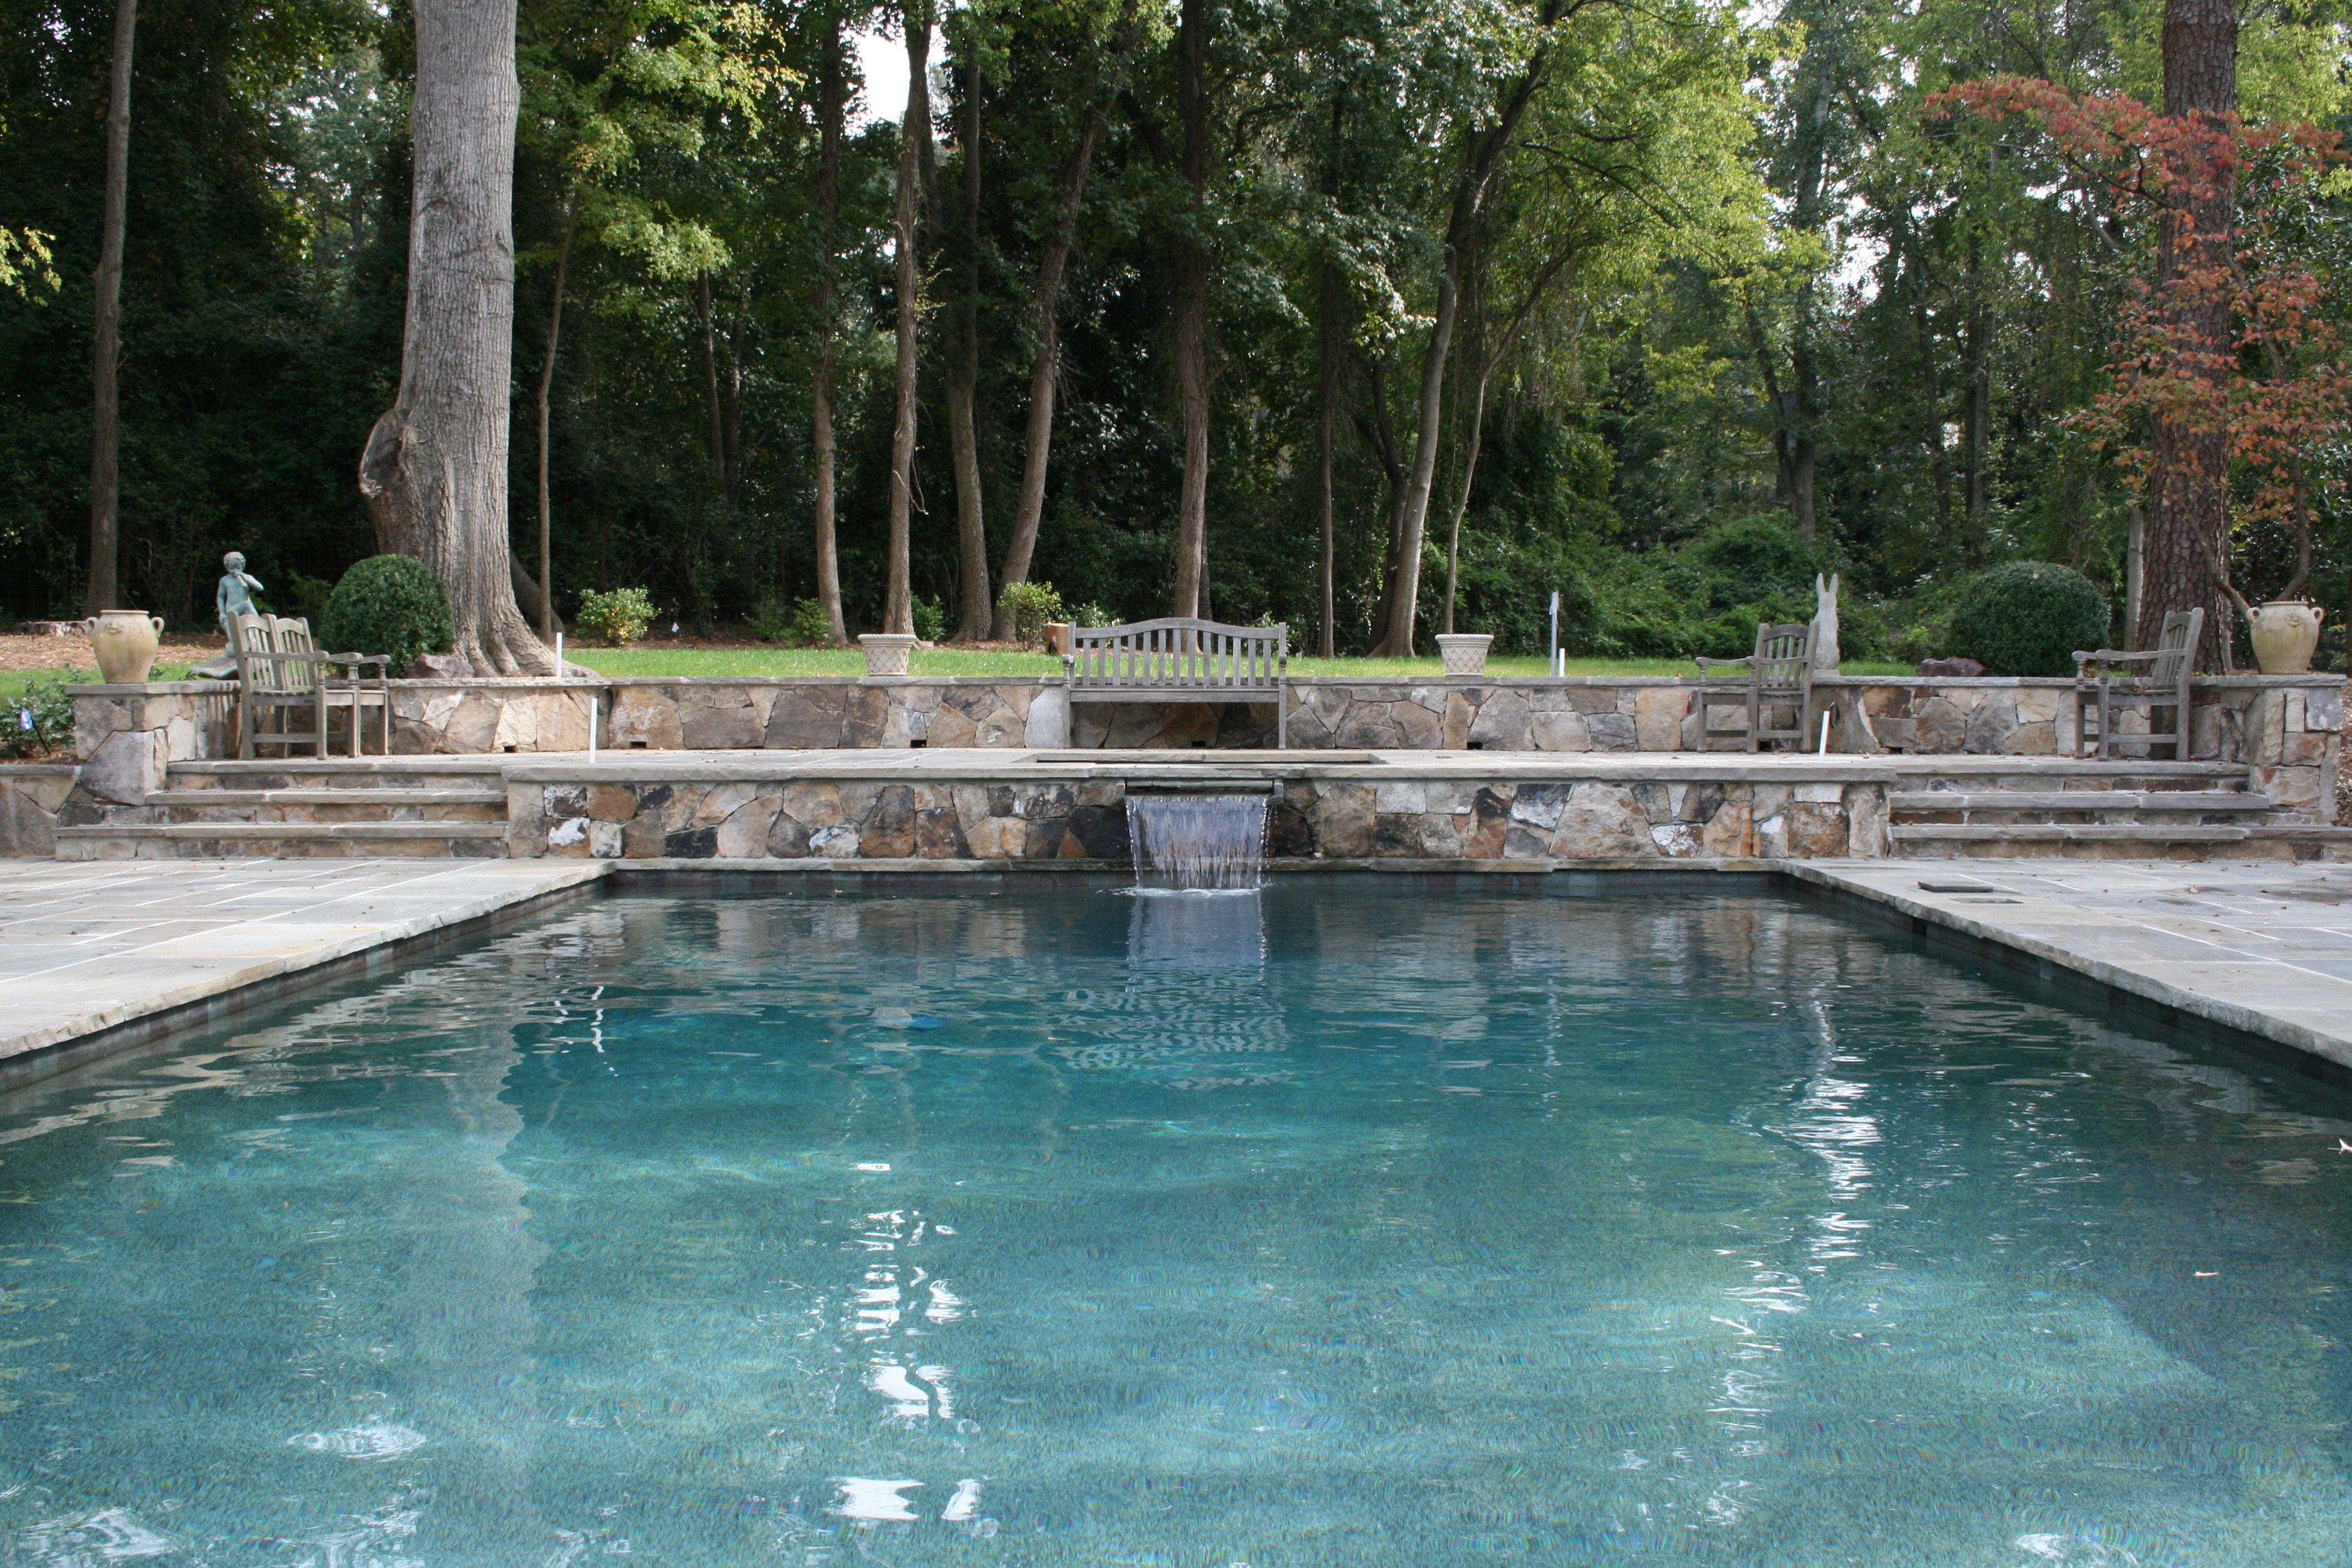 Allen Pool Service Pool Renovation Repairs Maintenance Pool Companies Pool Pool Renovation